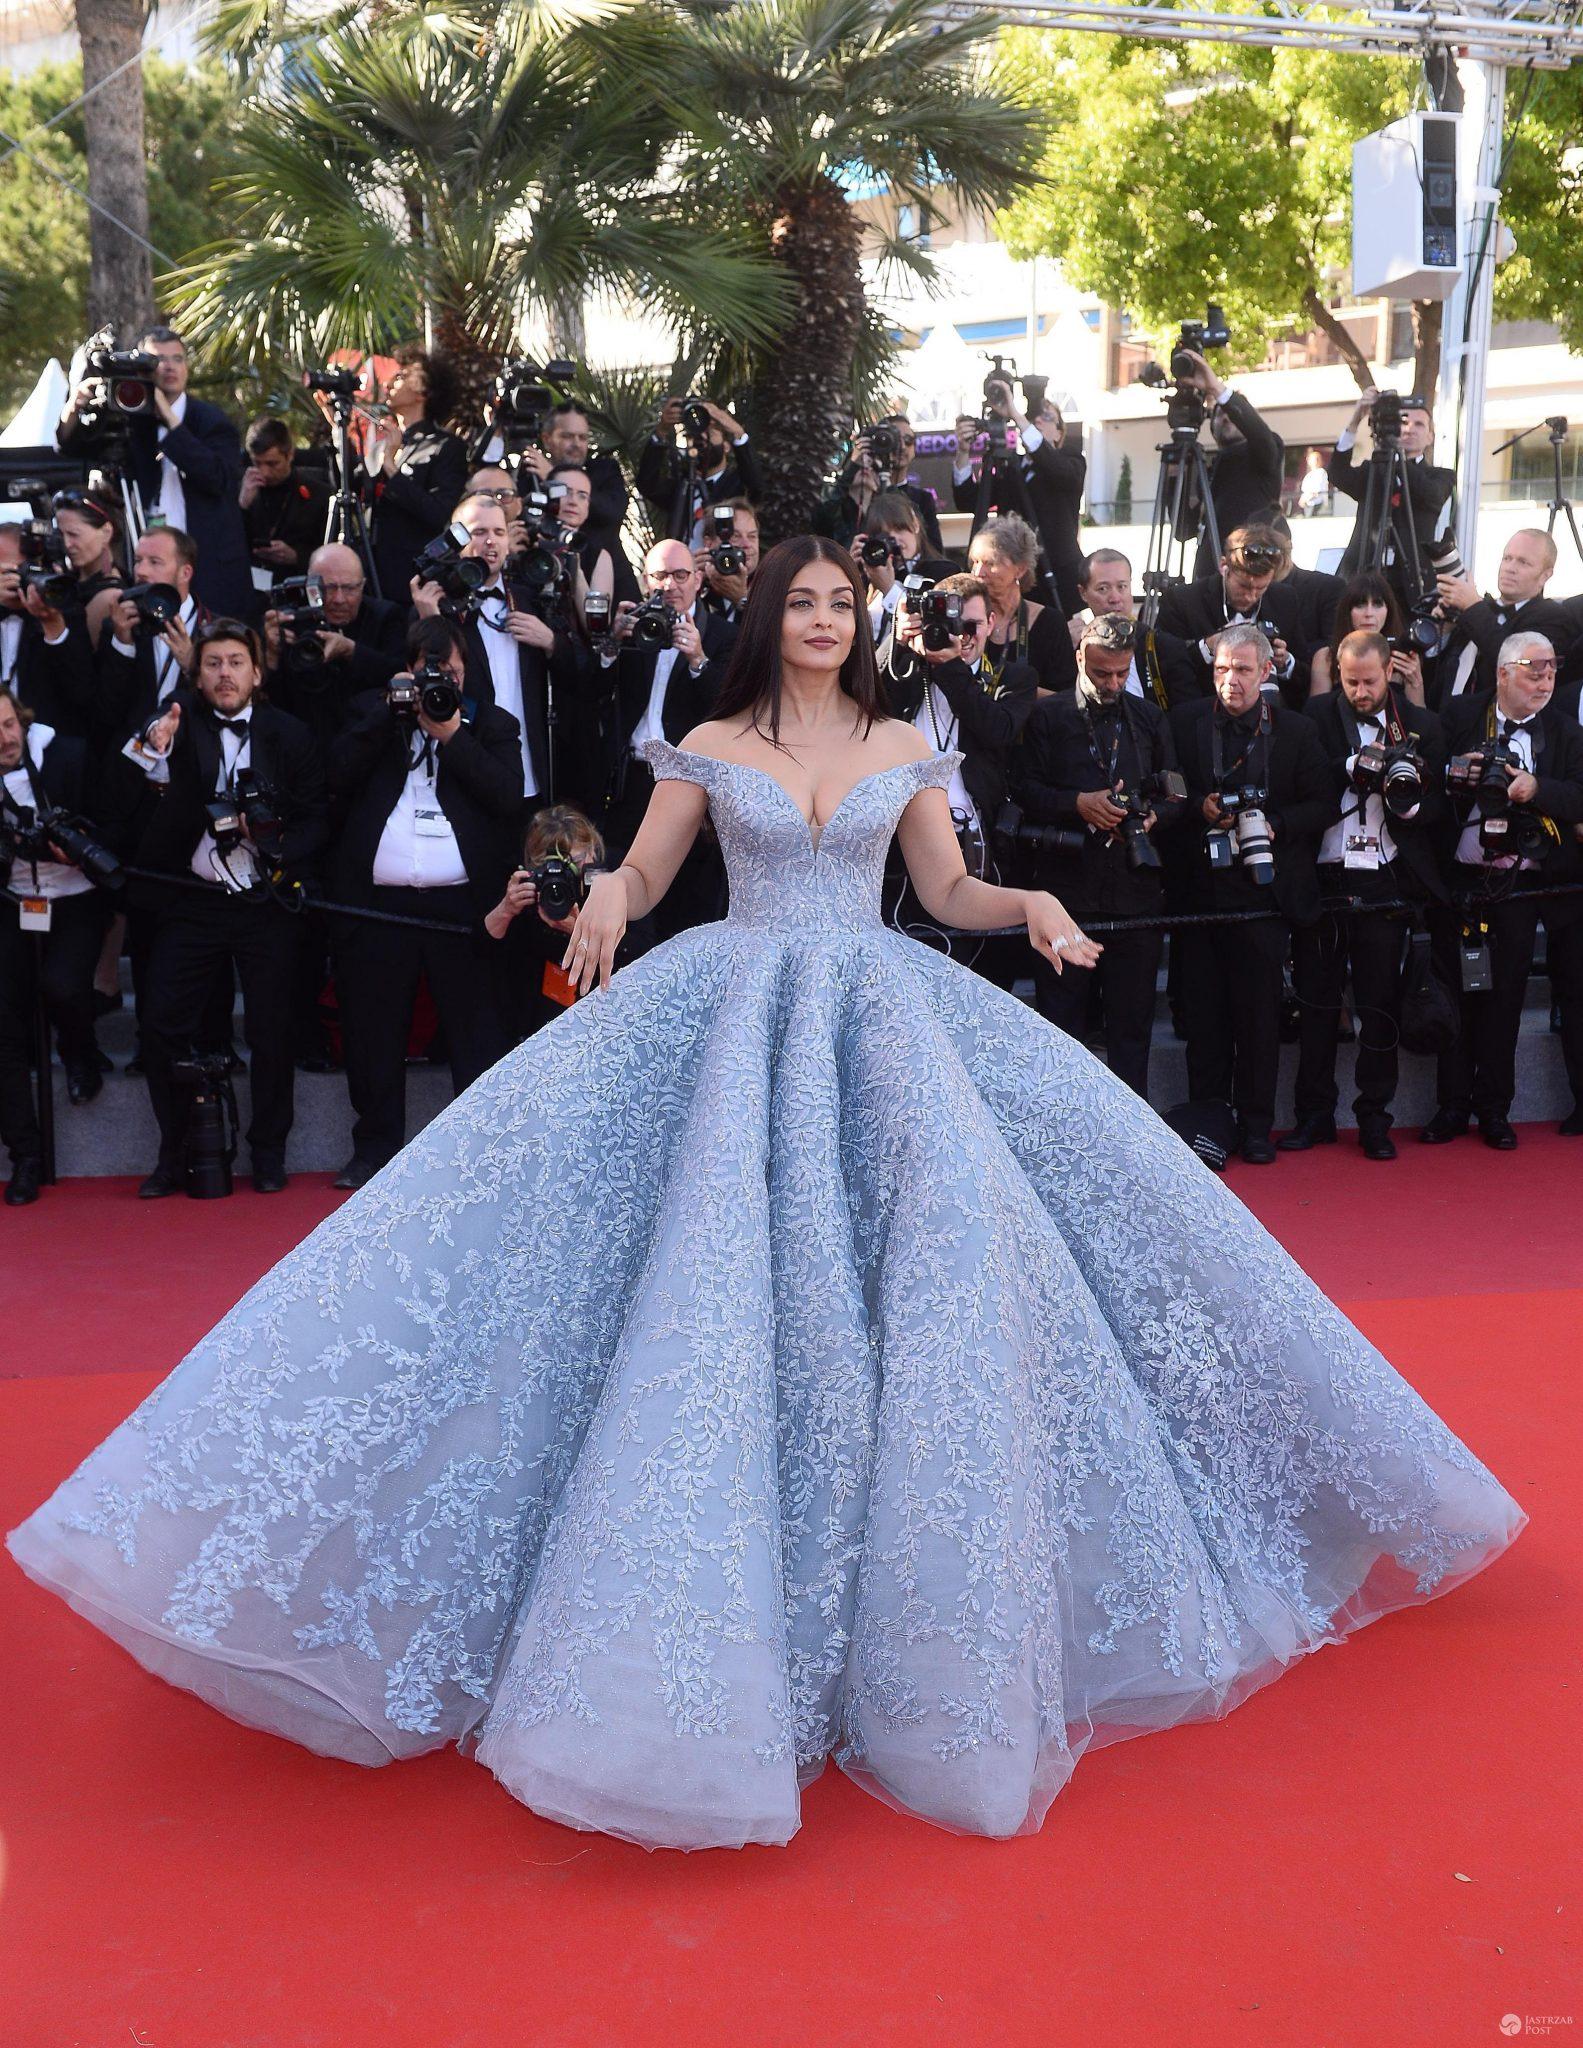 Aishwarya Rai Bachchan - Premiera filmu Okja 2017